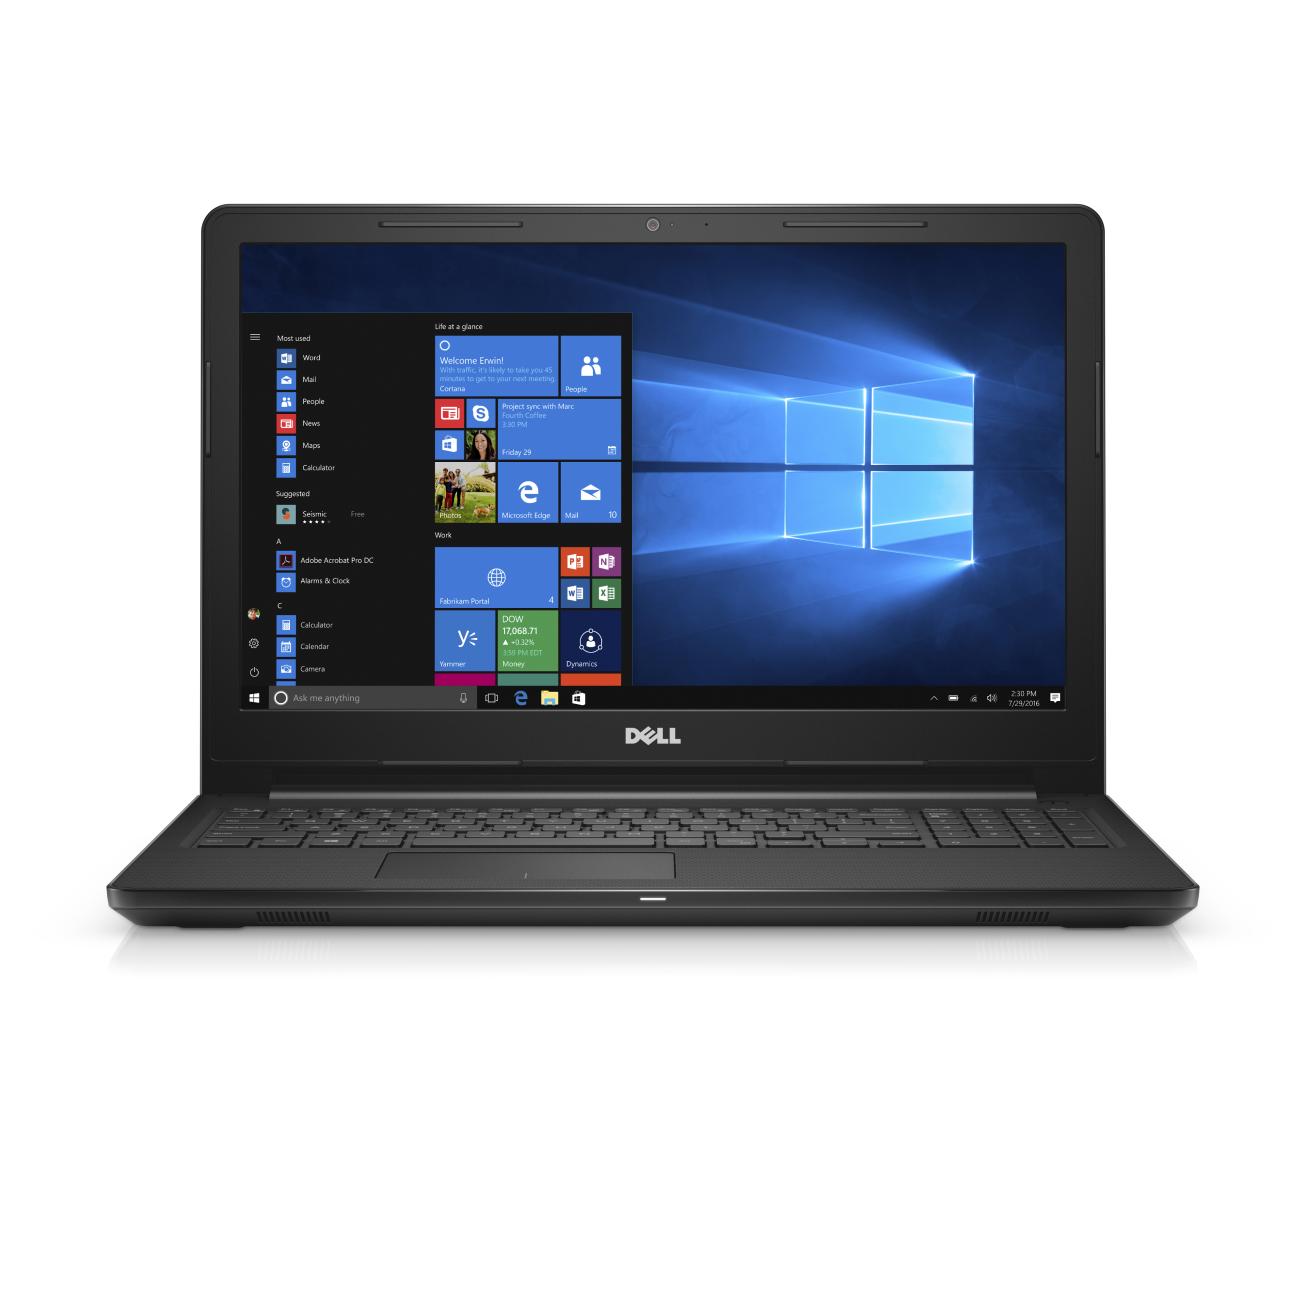 "Dell Inspiron 3567 Intel 7th i3-7130 8GB 1TB 15.6"" Win 10 One Year Dell Warranty"